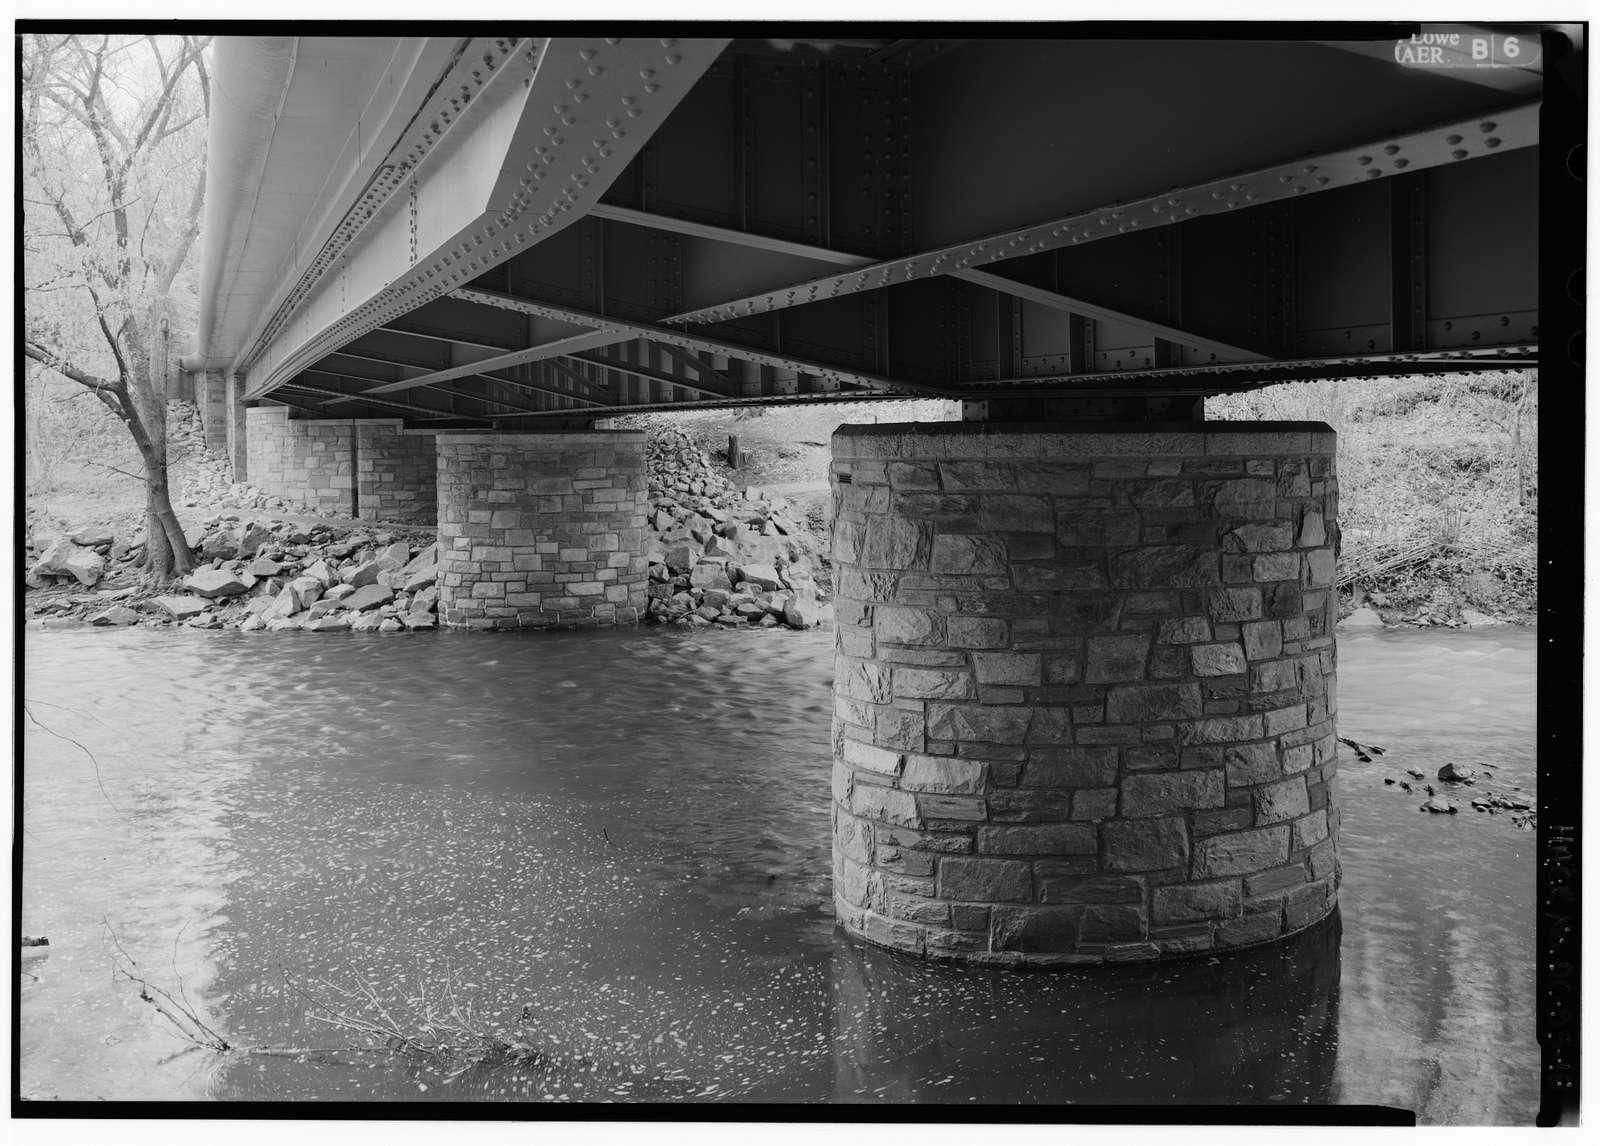 Rock Creek Park Road System, Washington, District of Columbia, DC